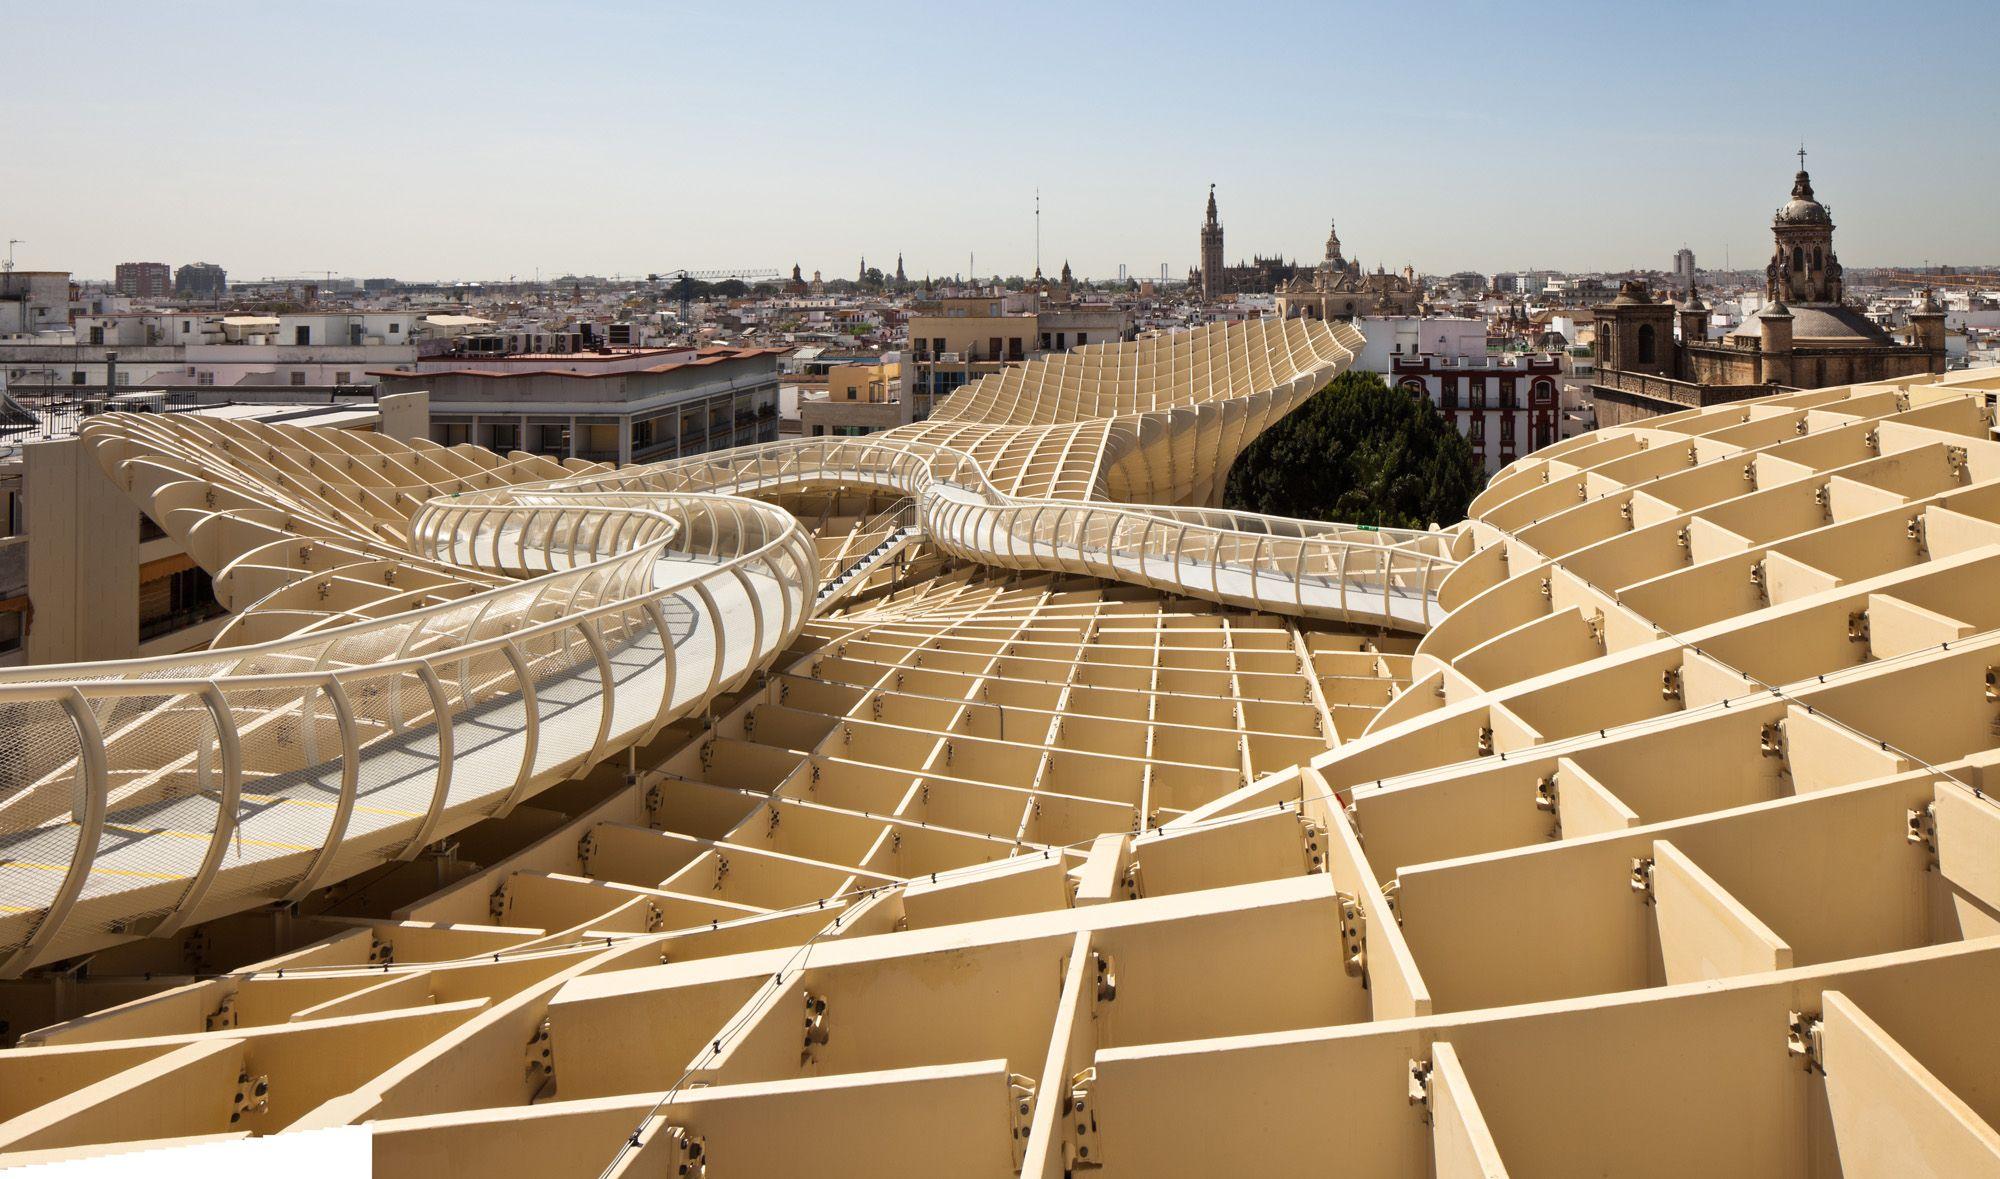 Espanha: Metropol Parasol, por J. Mayer H. Architects